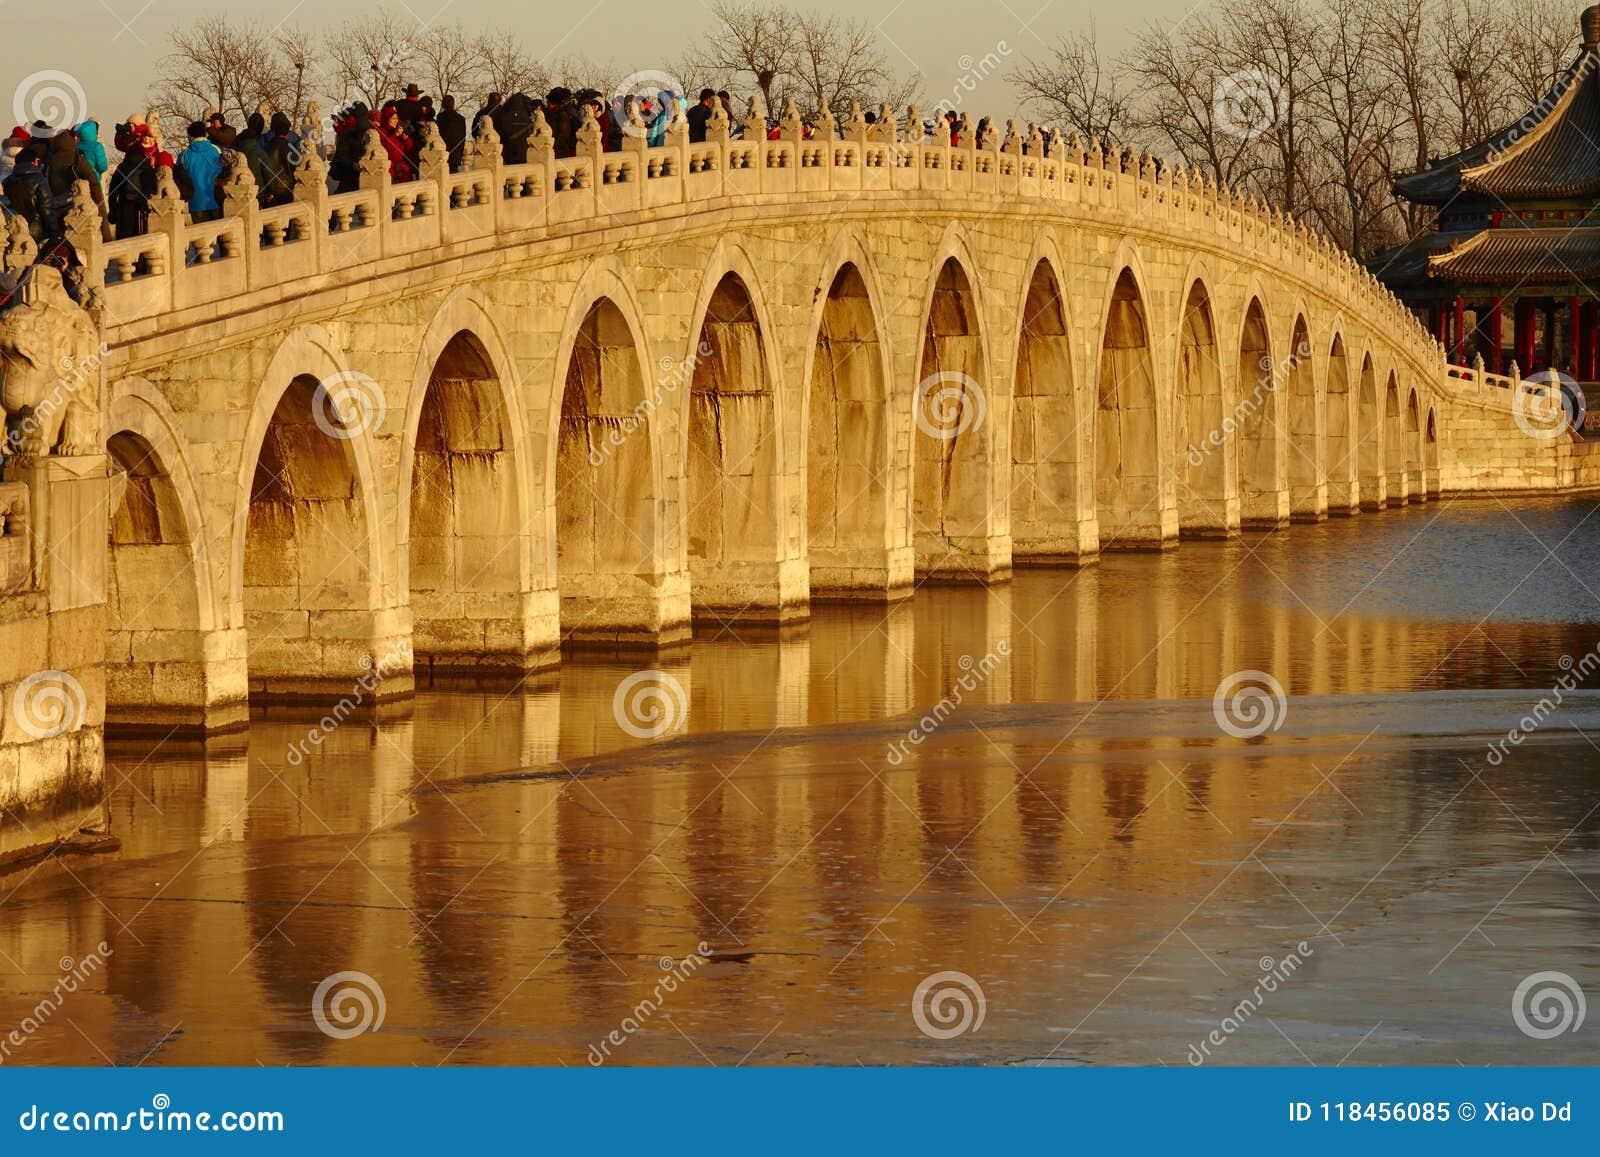 17 arch bridge sunset, China